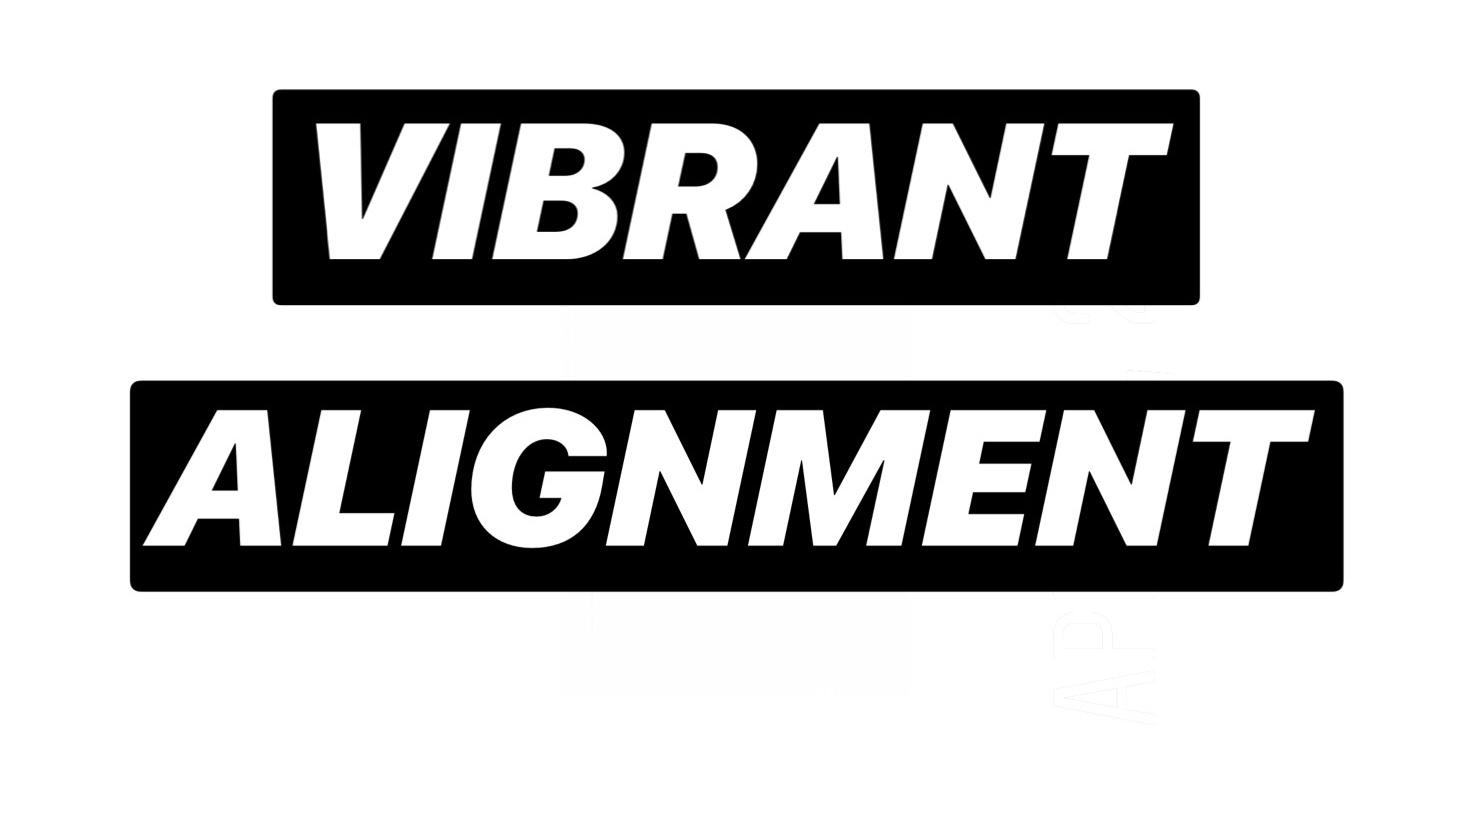 vibrant alignment